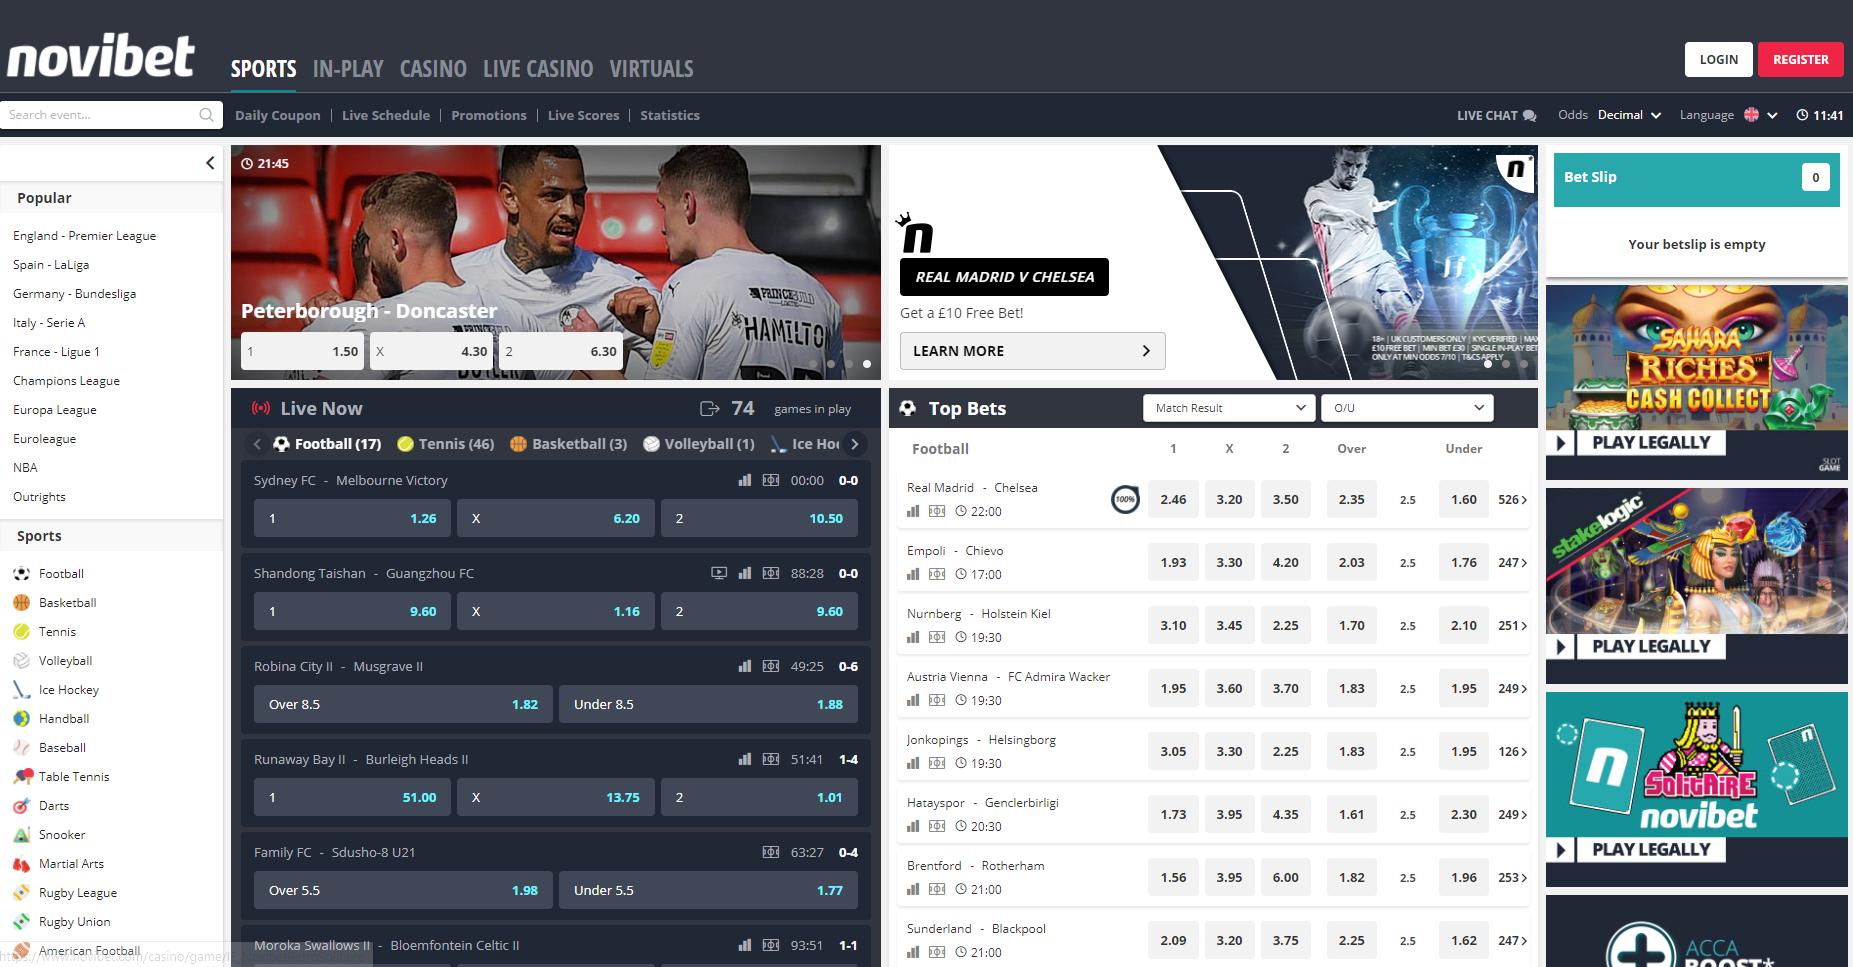 Интерфейс сайта новибет